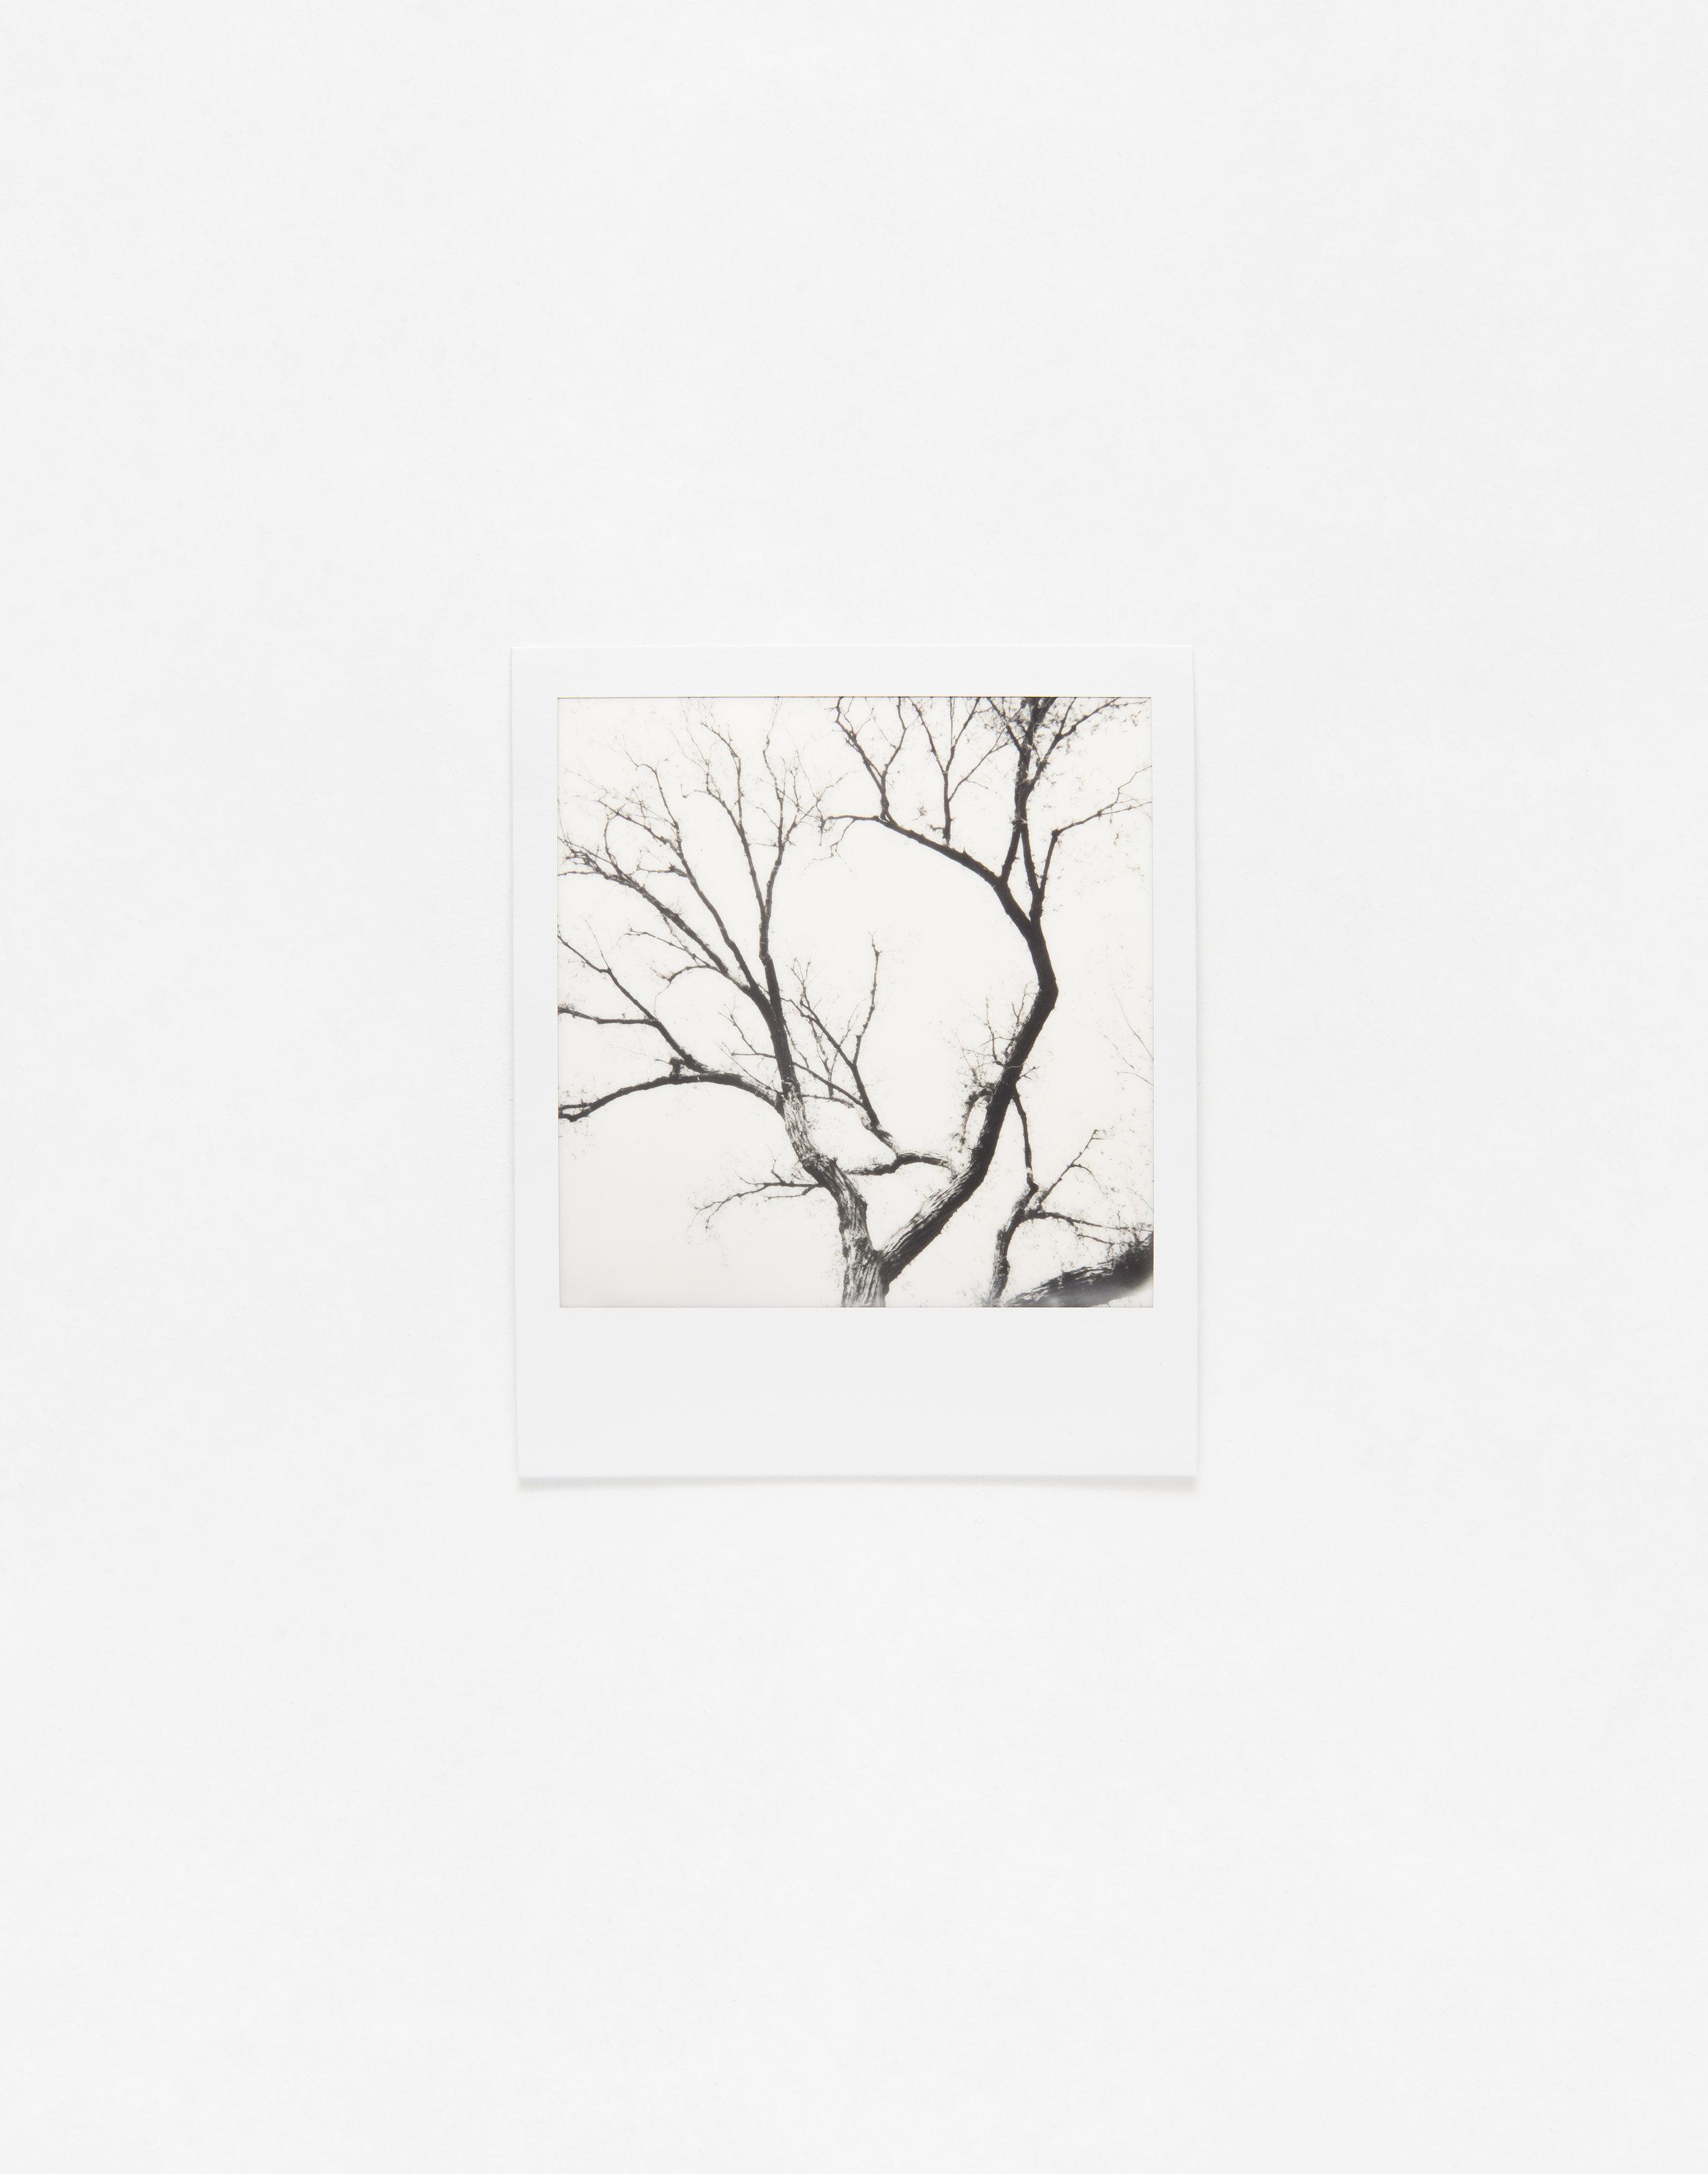 180331_Polaroid_0028_test.jpg